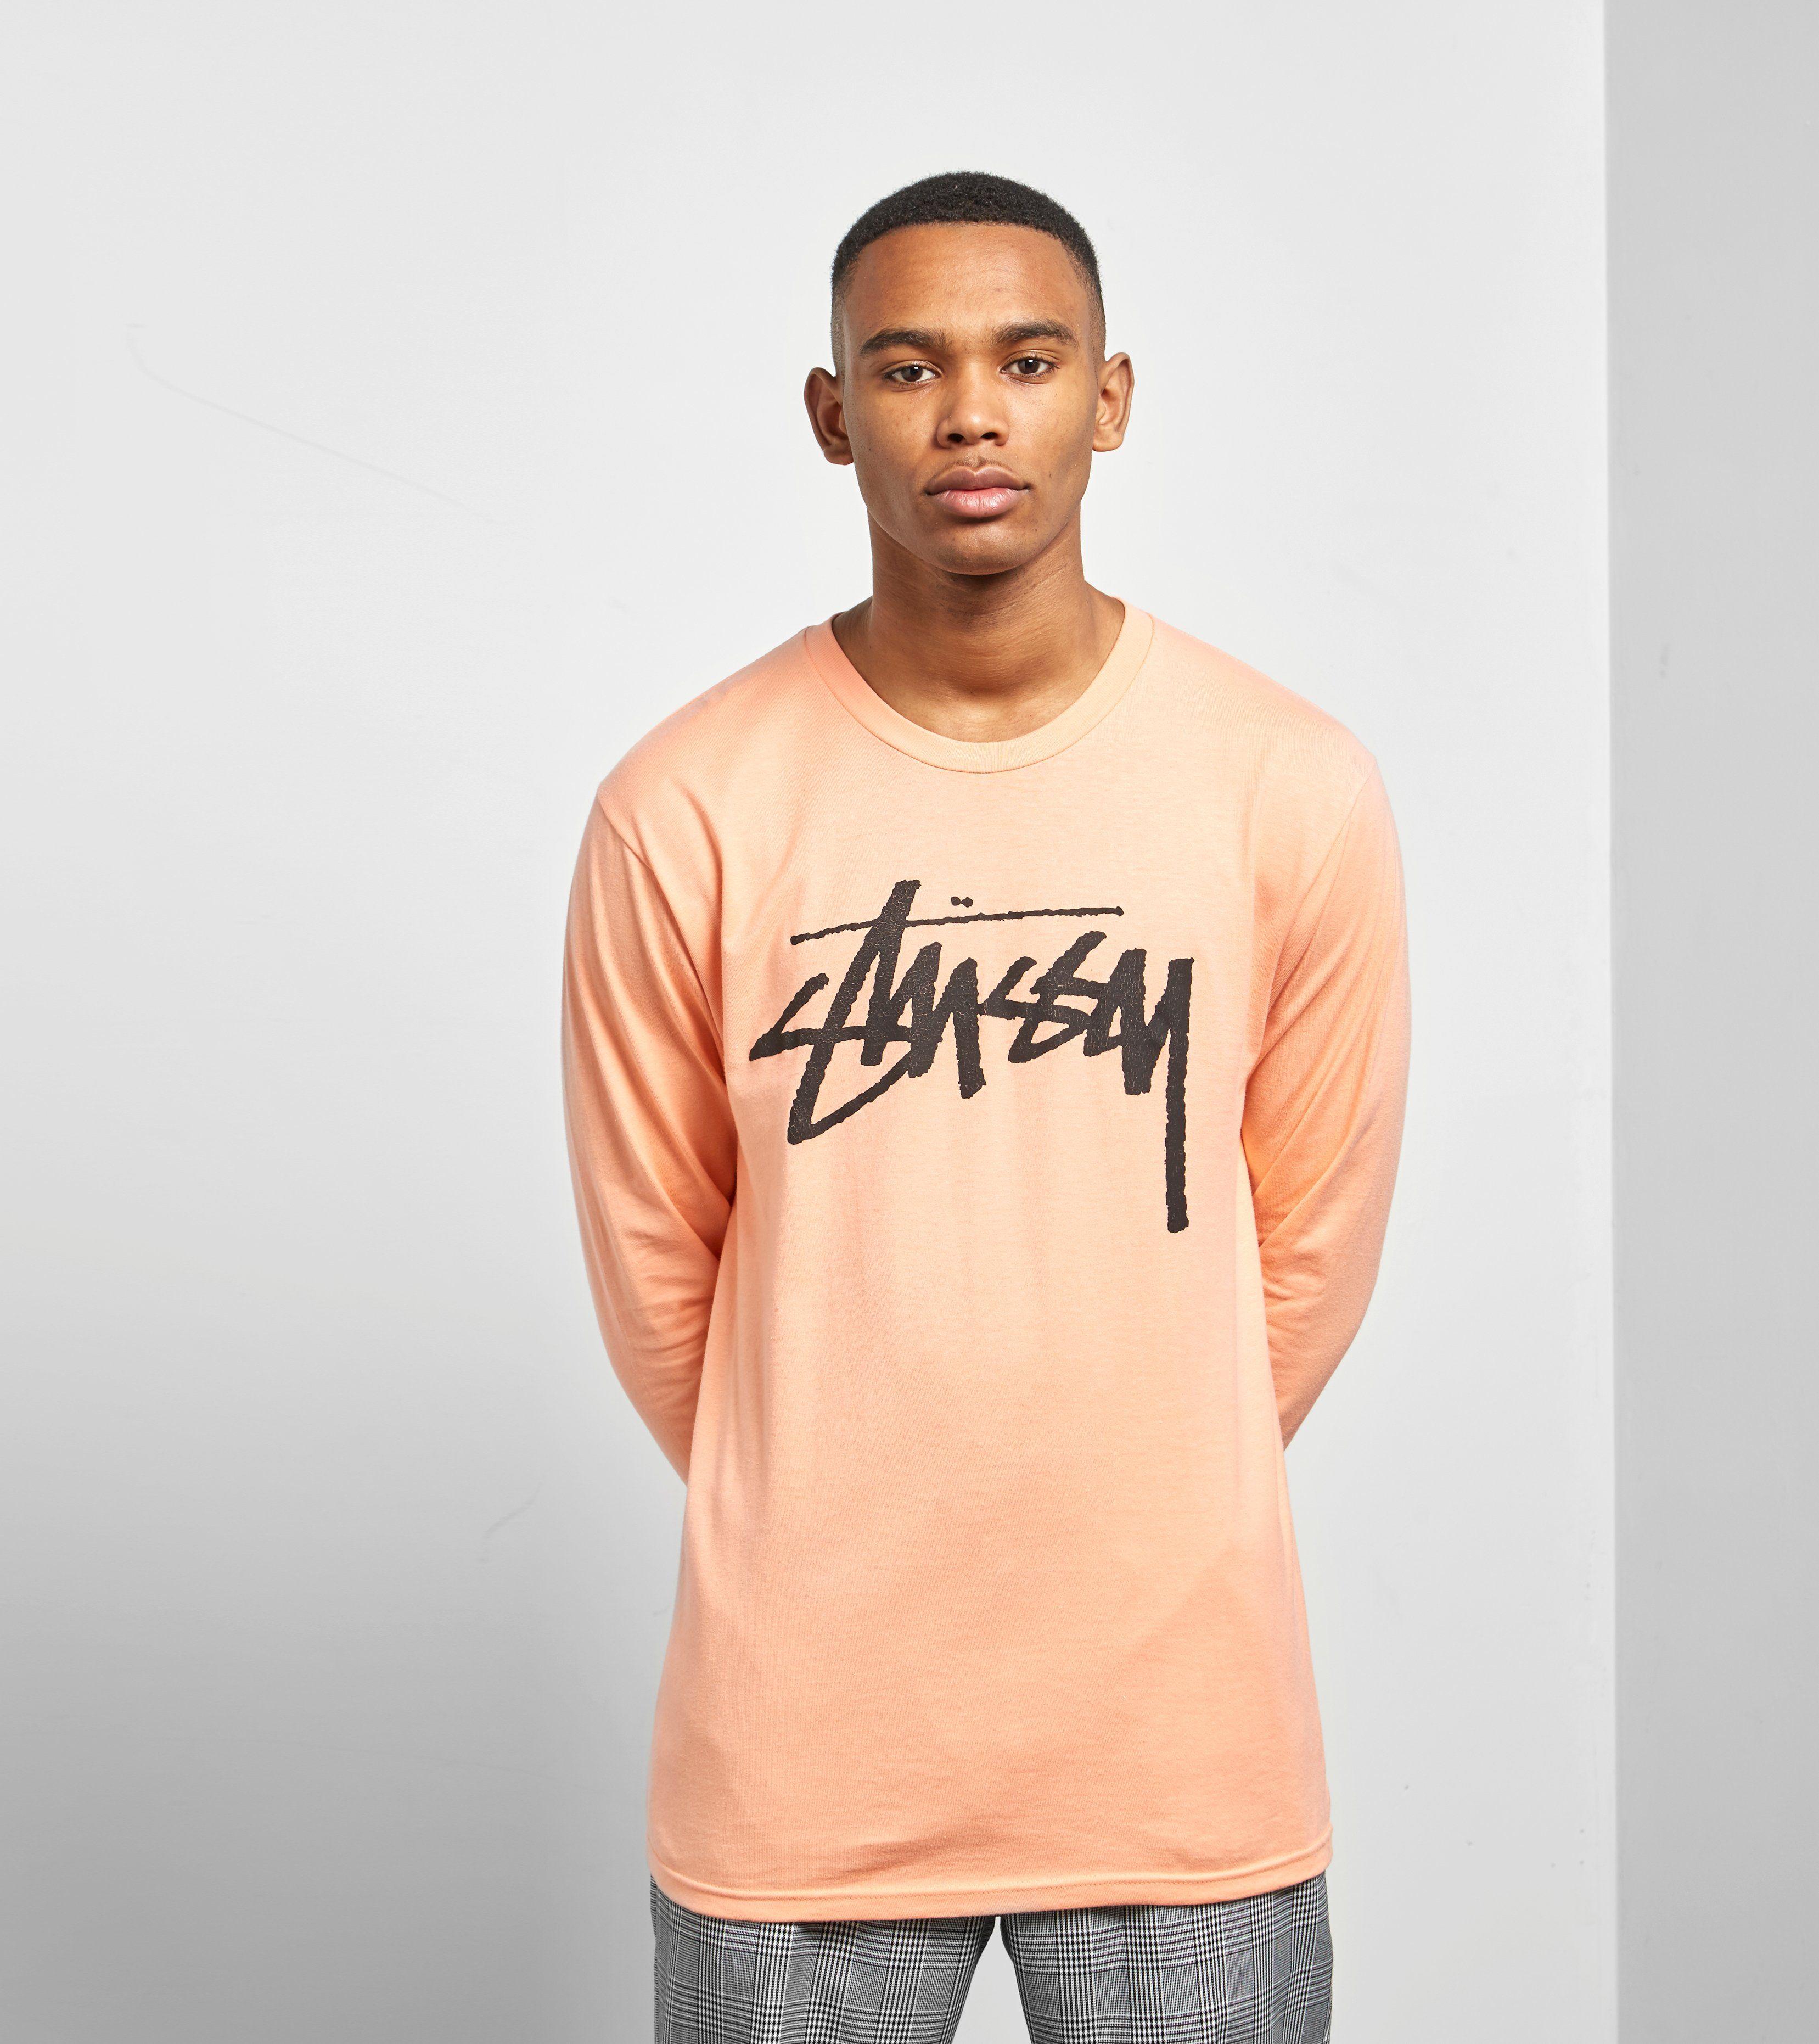 Stussy Old Stock Långärmad T-skjorta